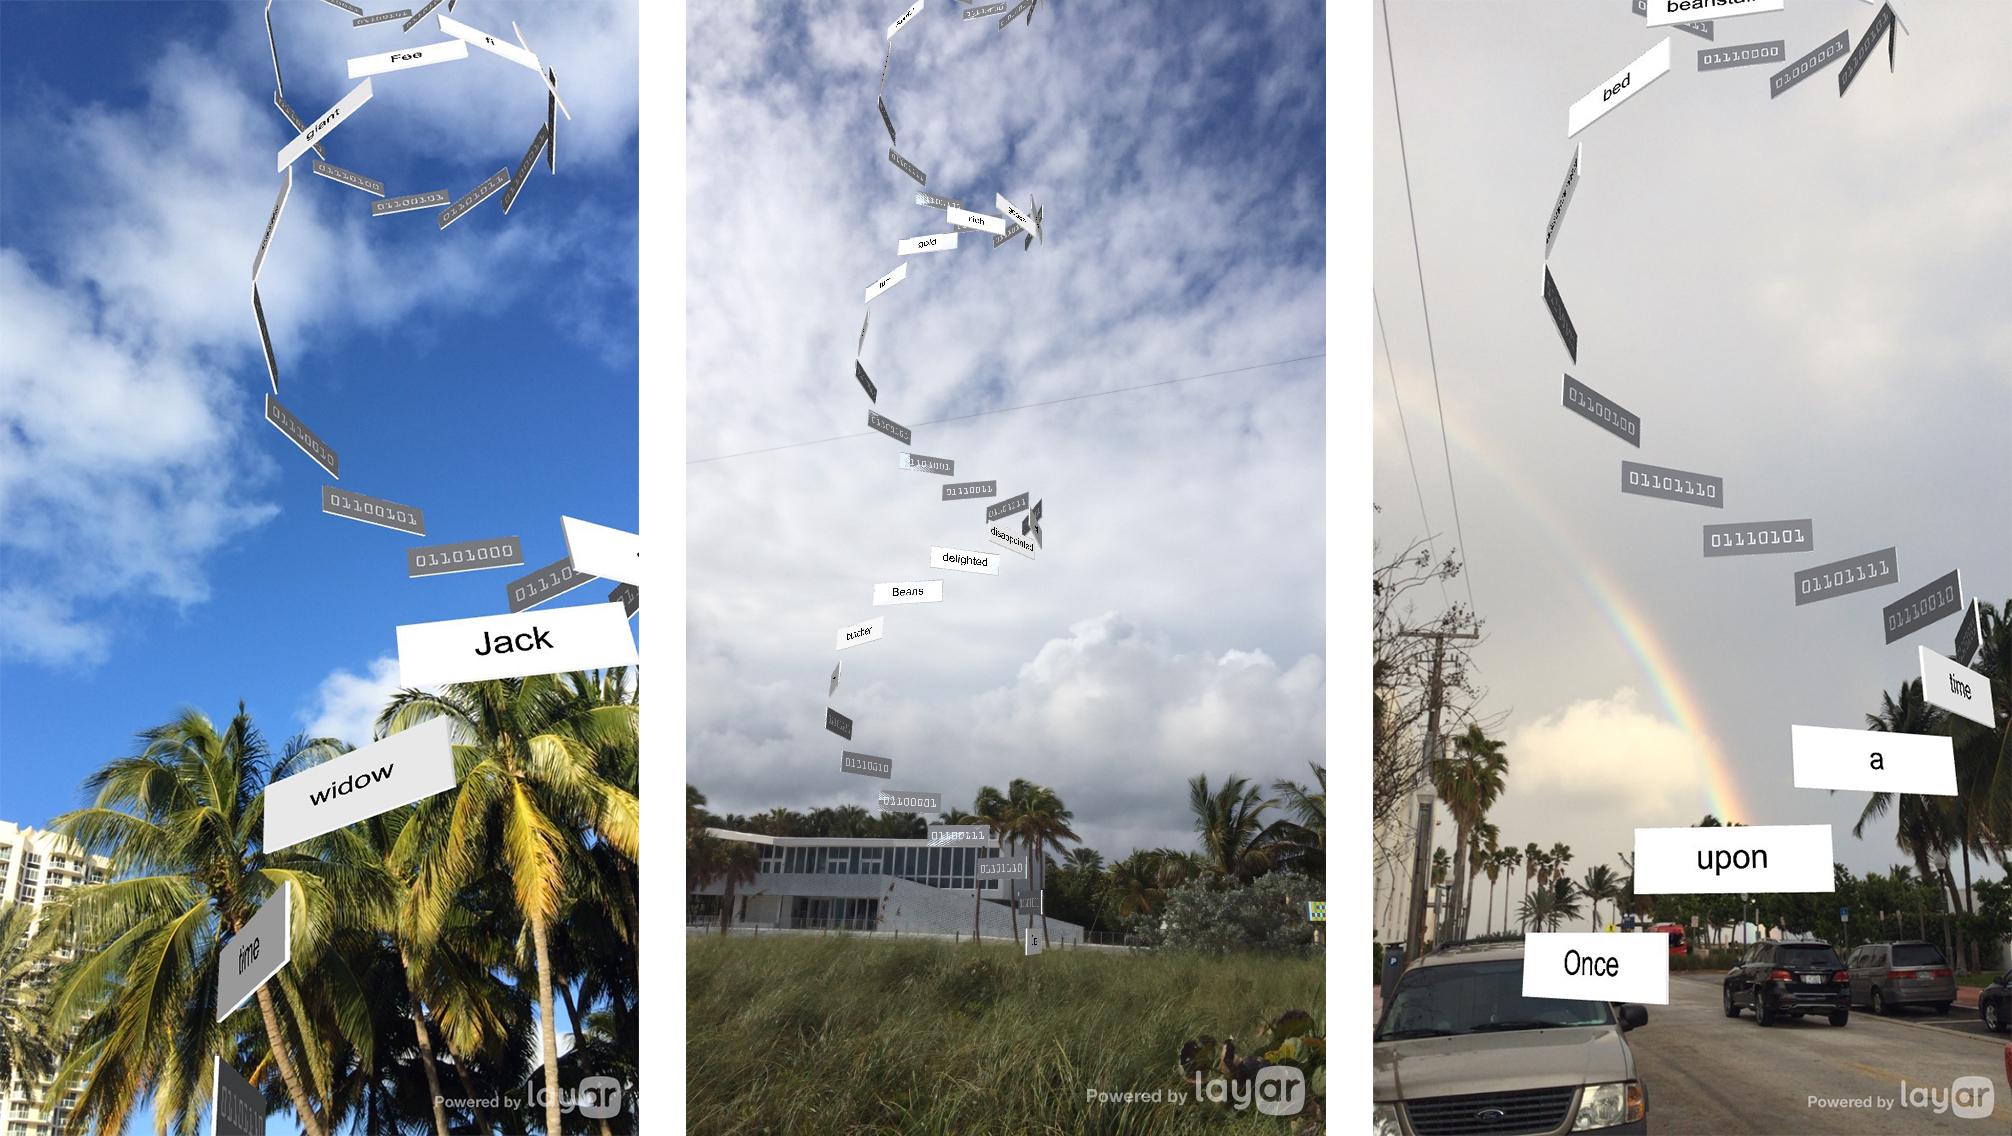 Installation views, Harp of the Giant (partial), 2015, Richard Humann, AR ©Spark Art Management/SPARK+